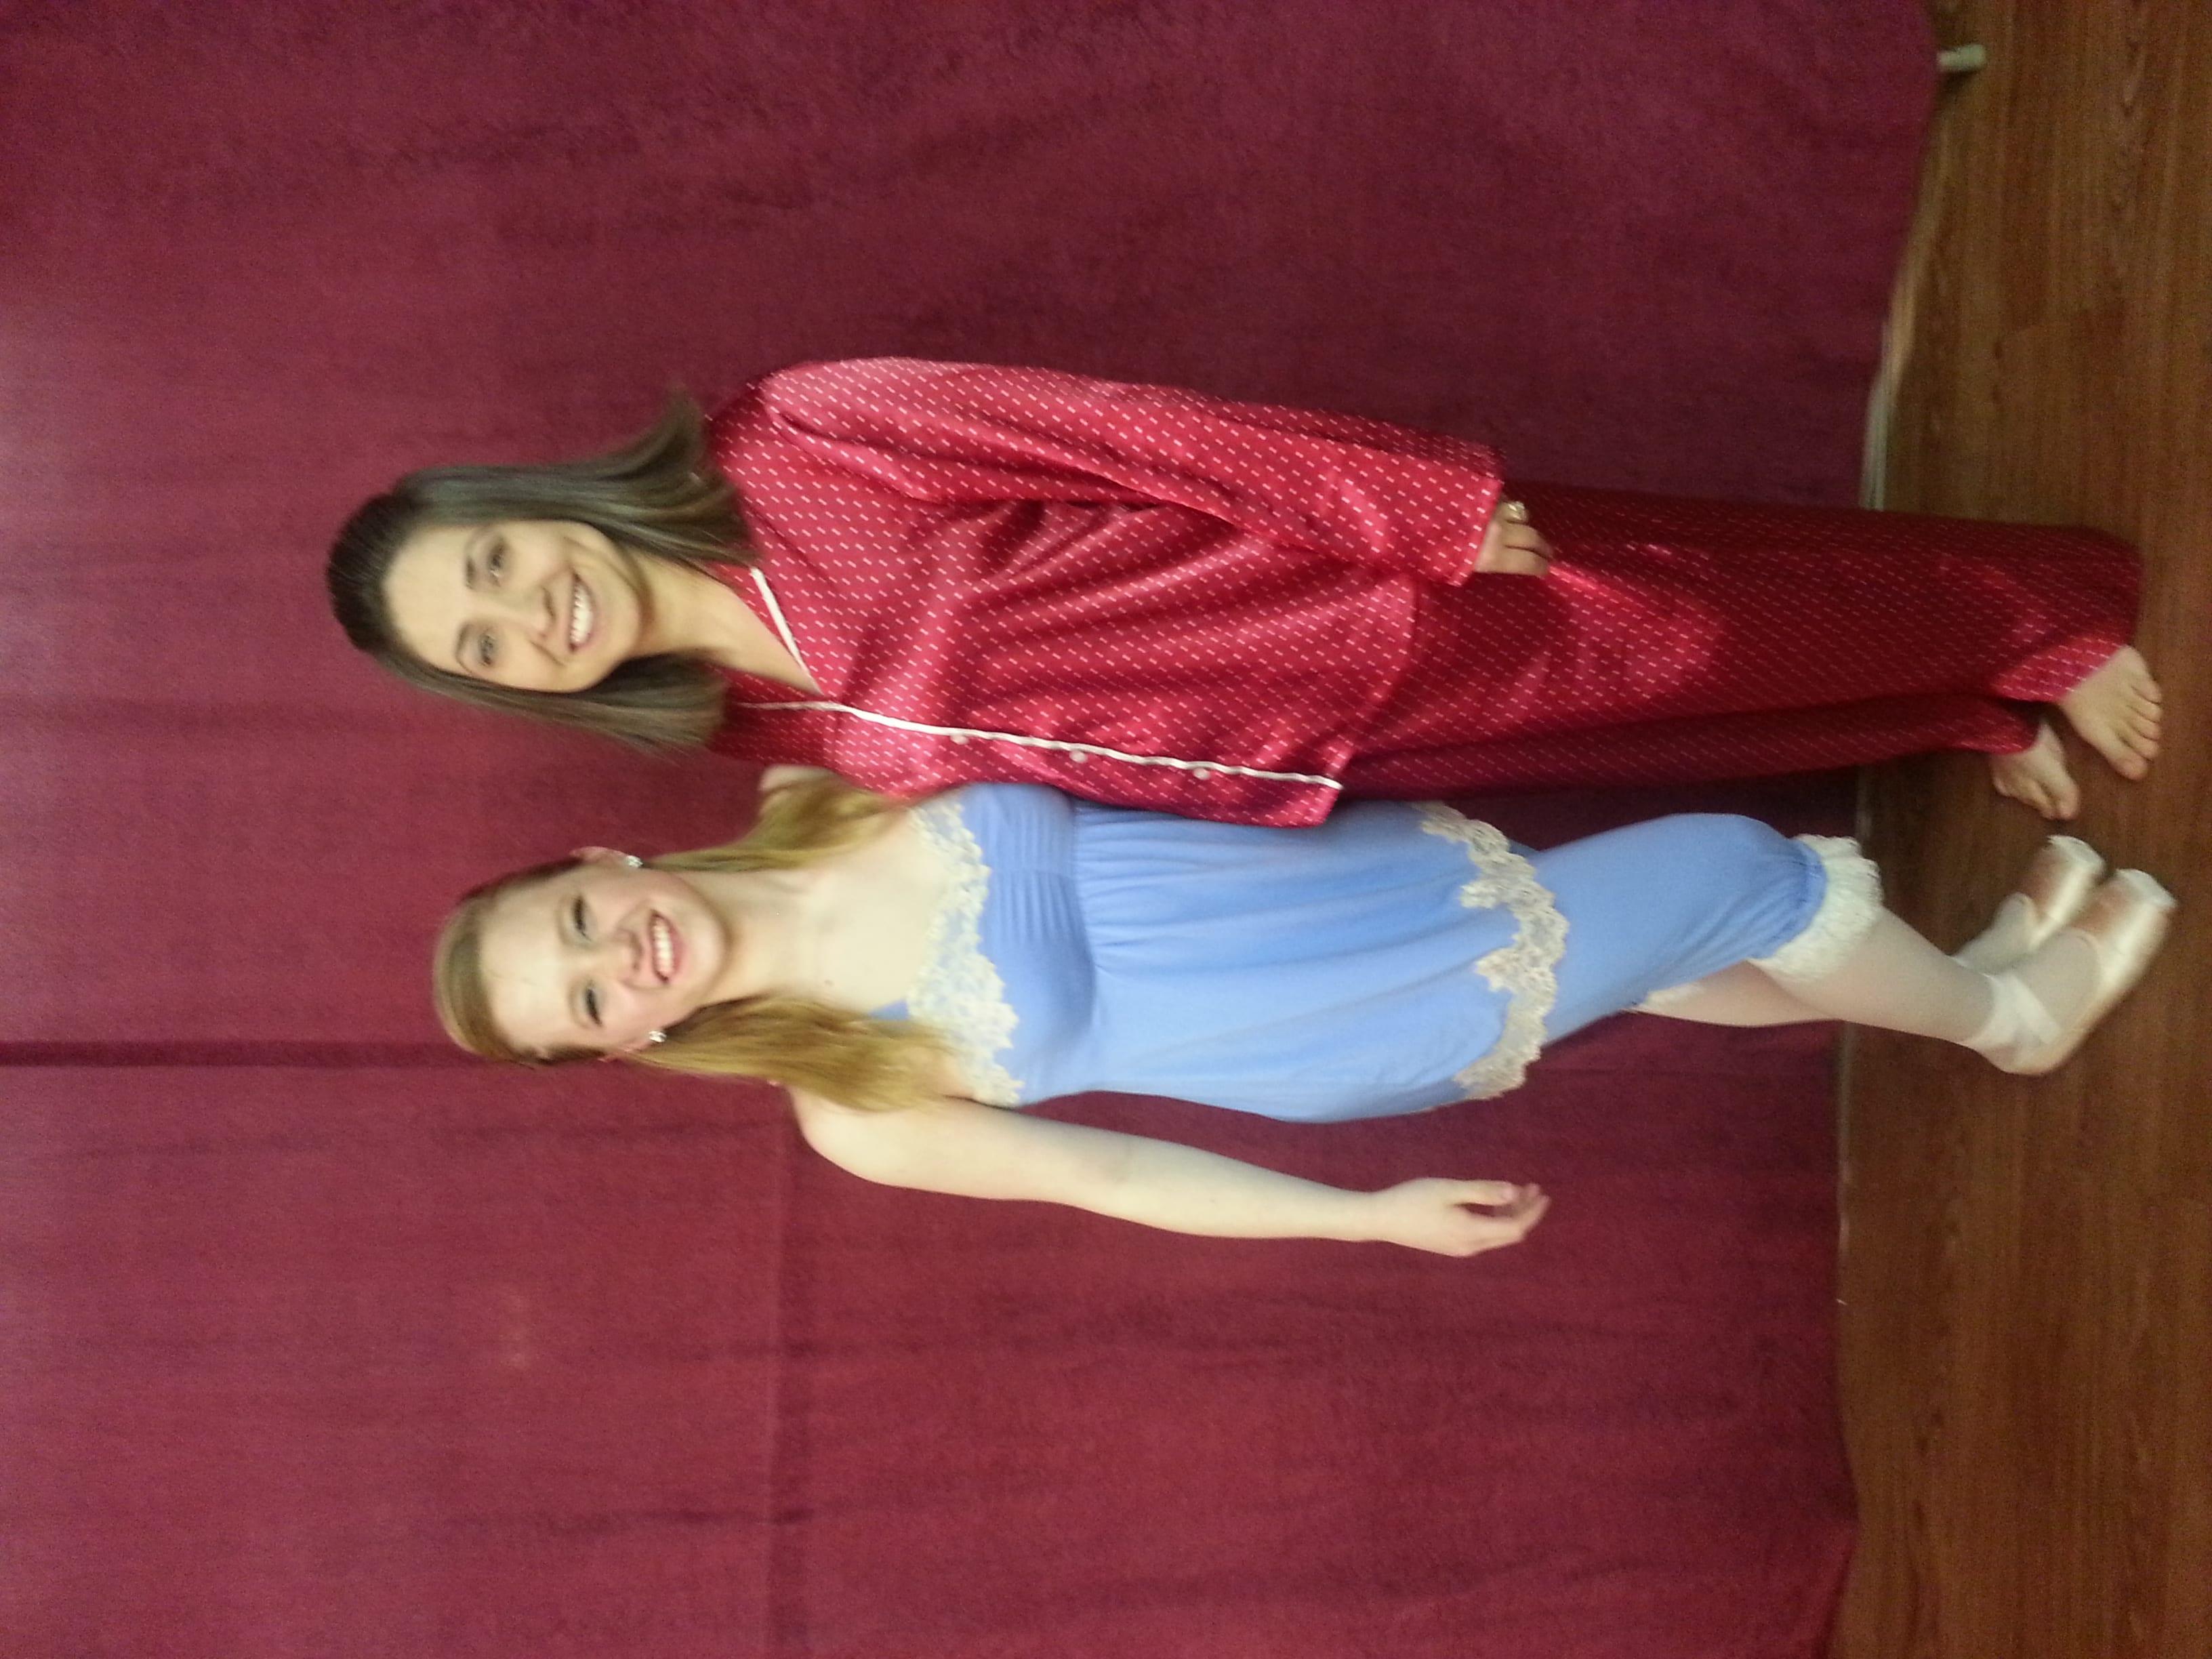 20130317_134606 – Beth Fowler School of Dance : Genoa and St. Charles Illinois